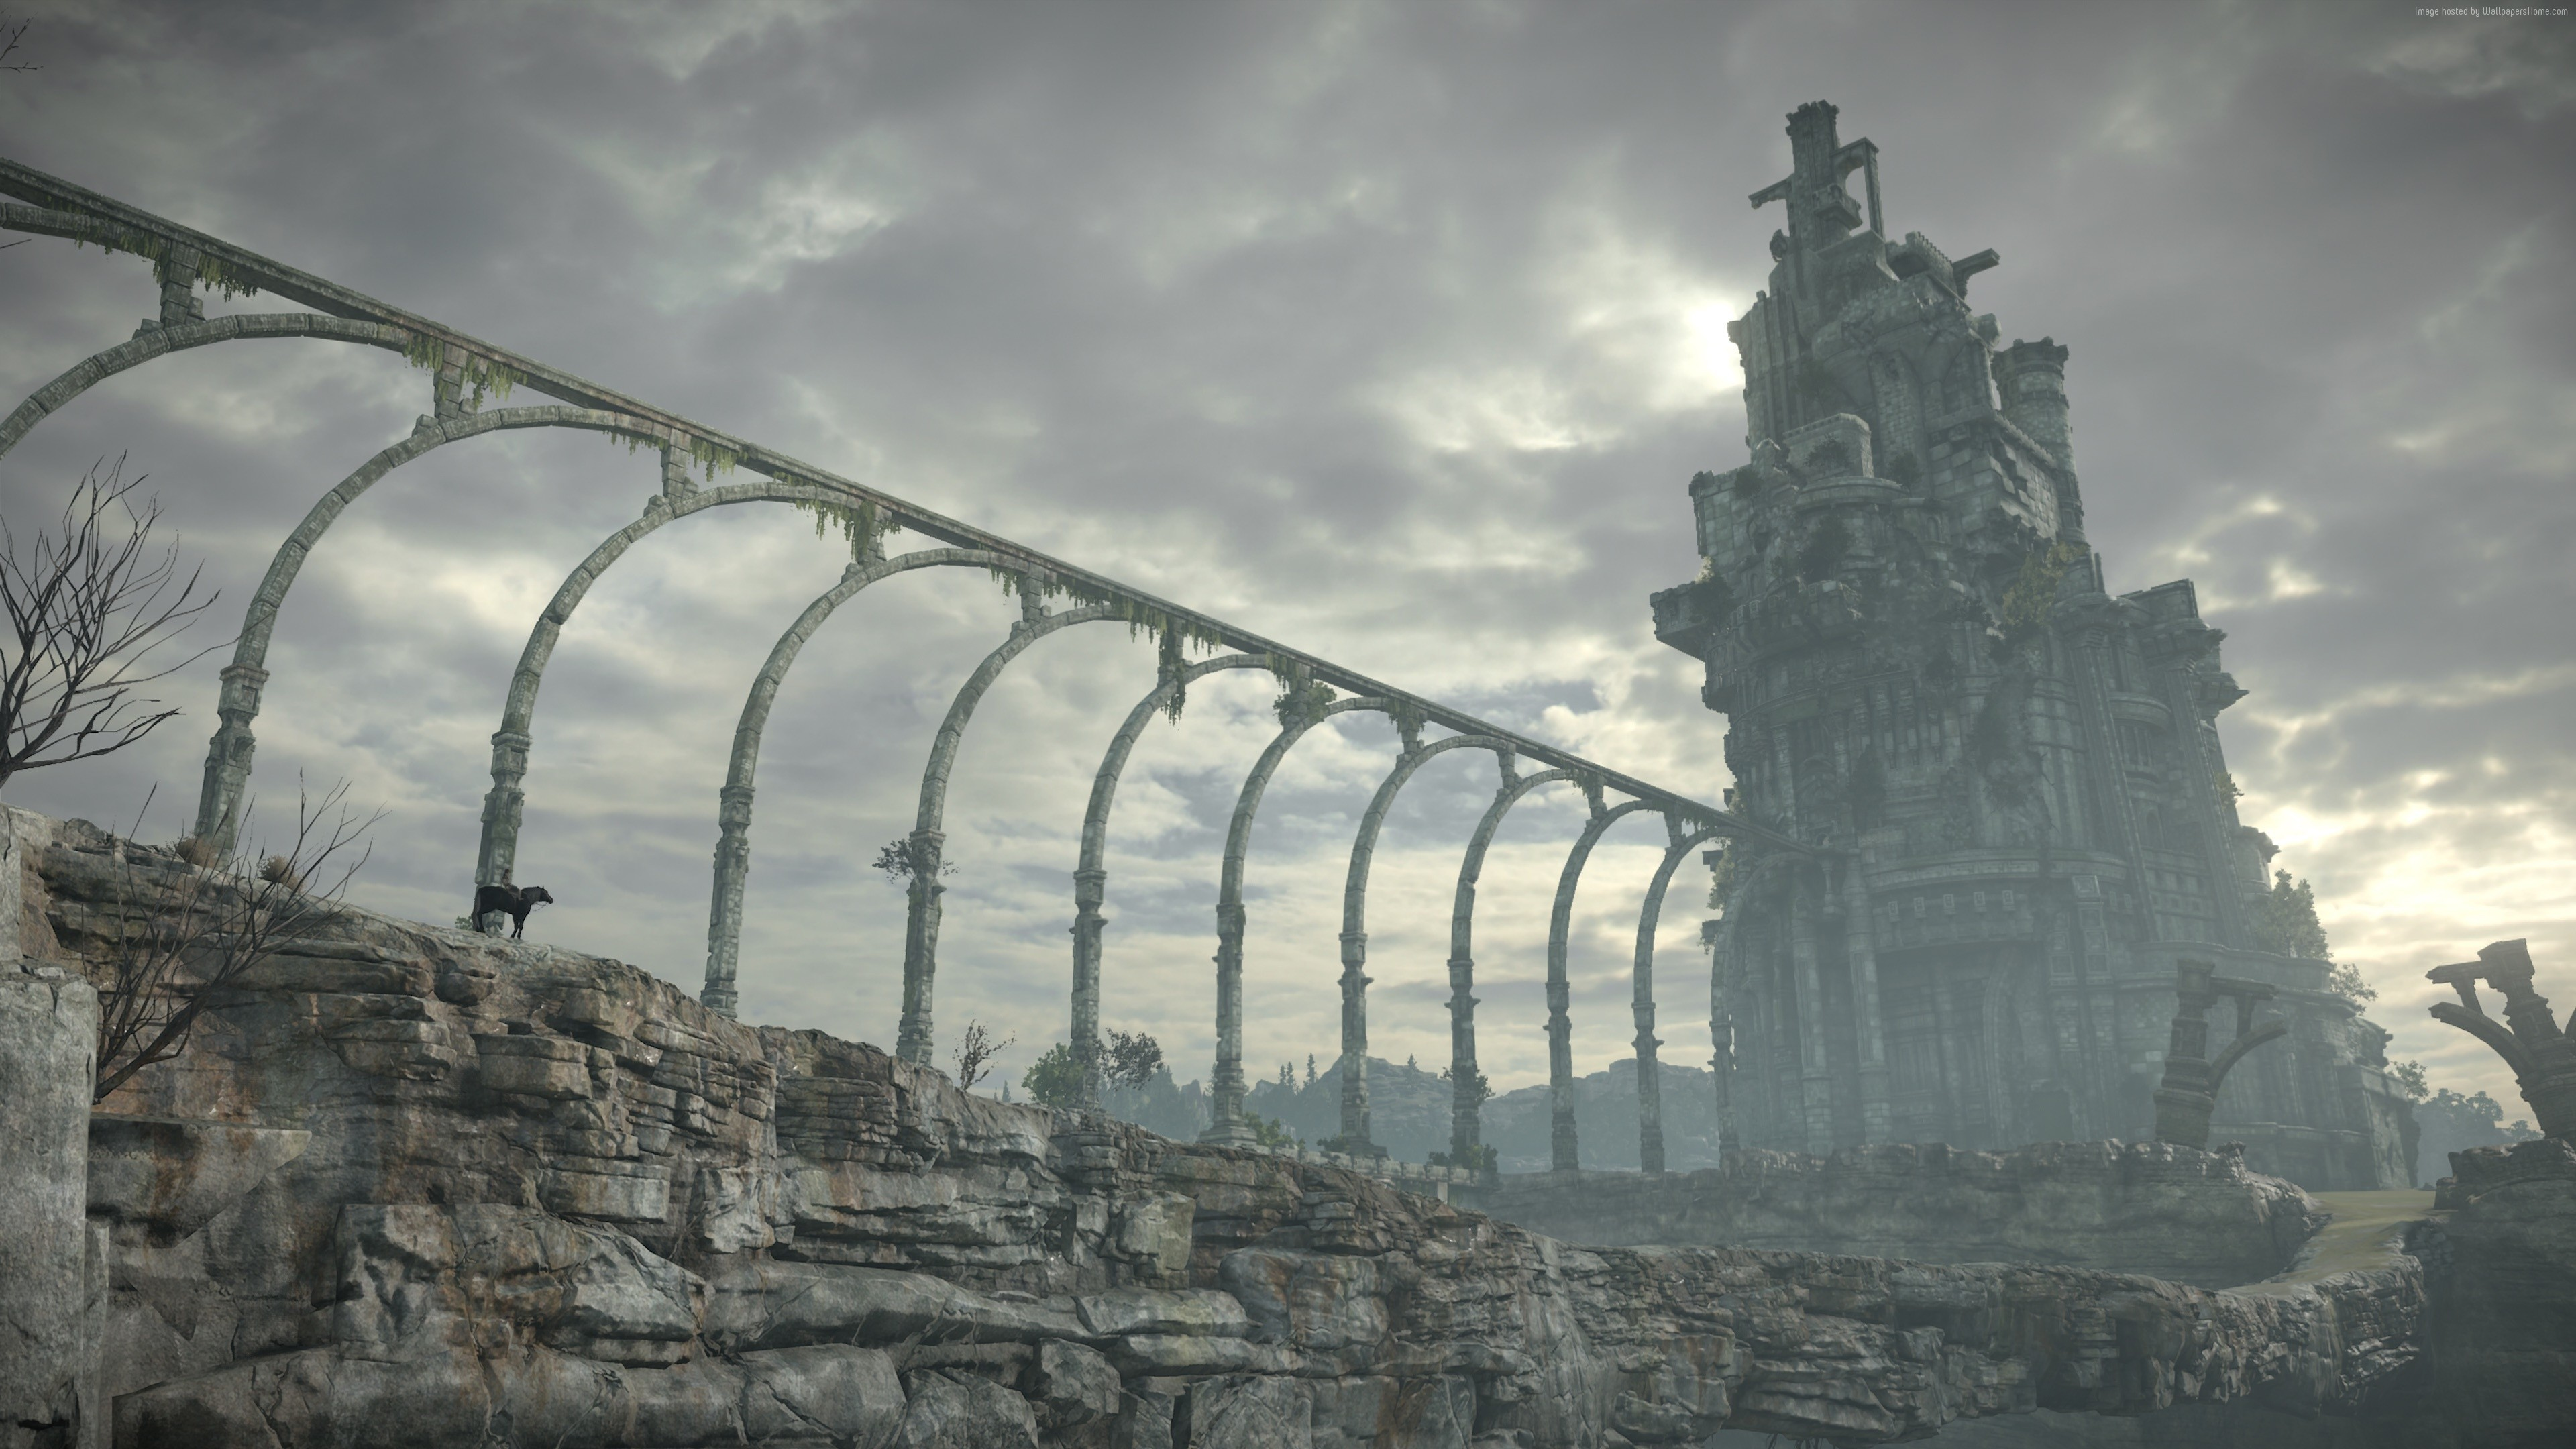 Shadow of the Colossus, 4k, screenshot, E3 2017 (horizontal) …